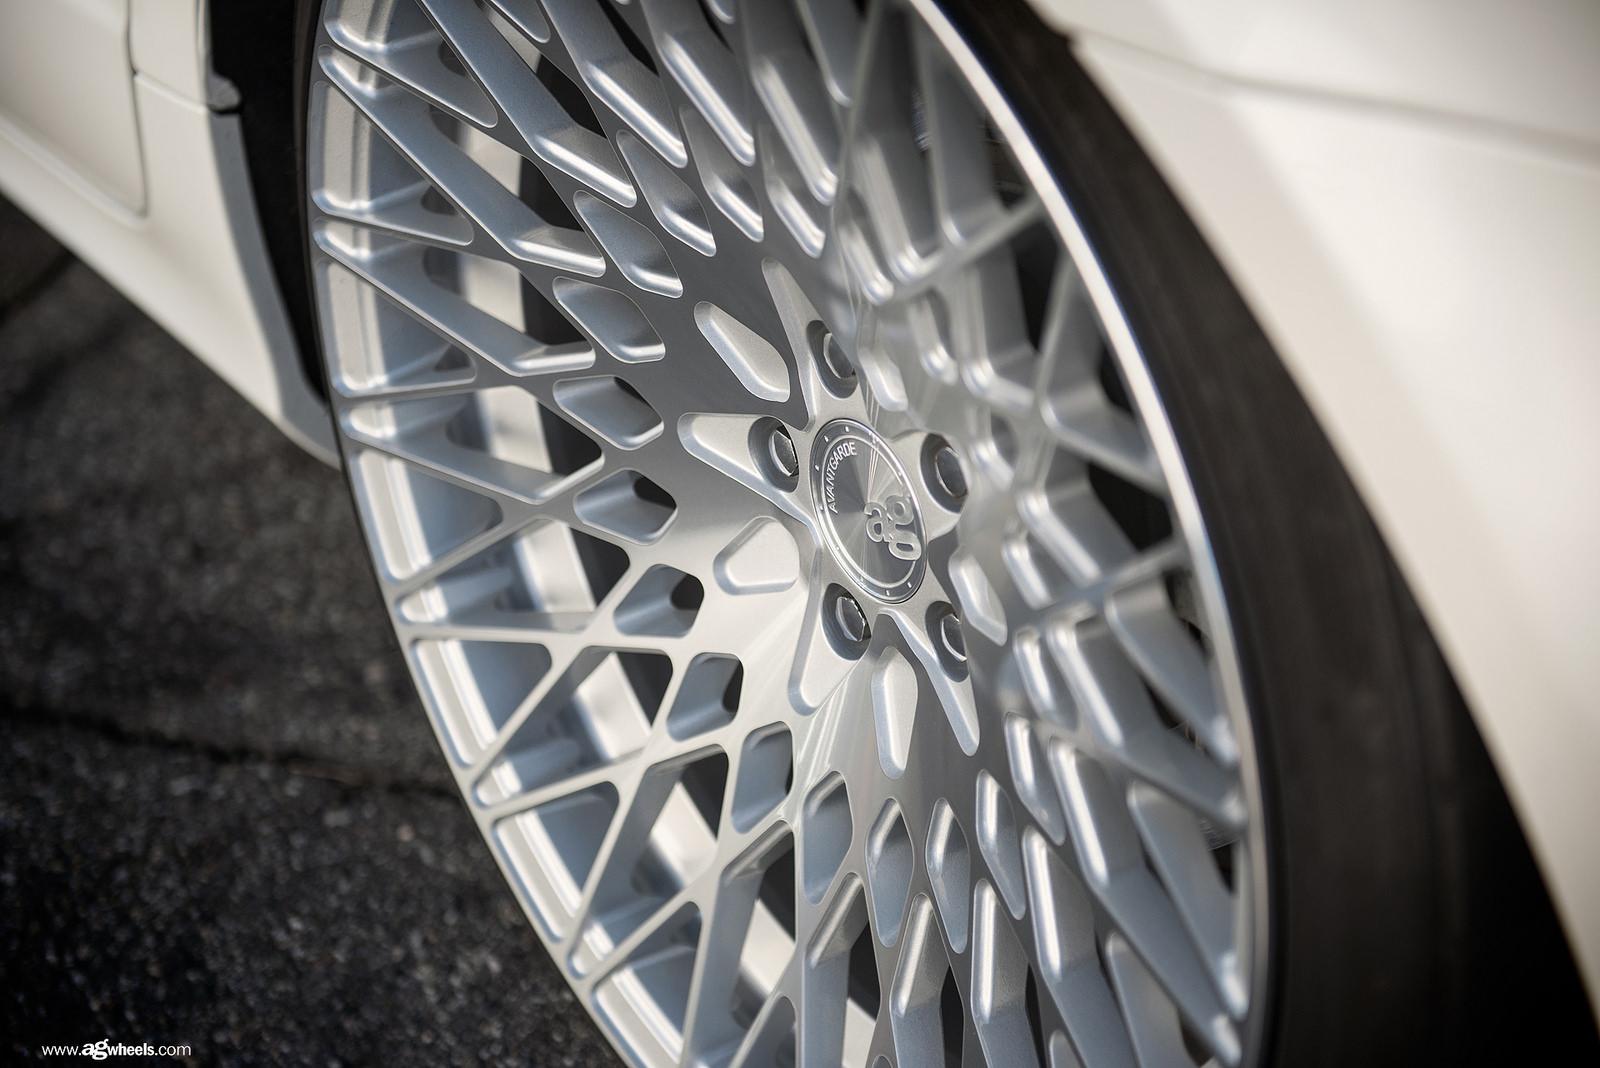 Avant Garde M540 Wheels for Mercedes-Benz 19in/20in 5x112mm